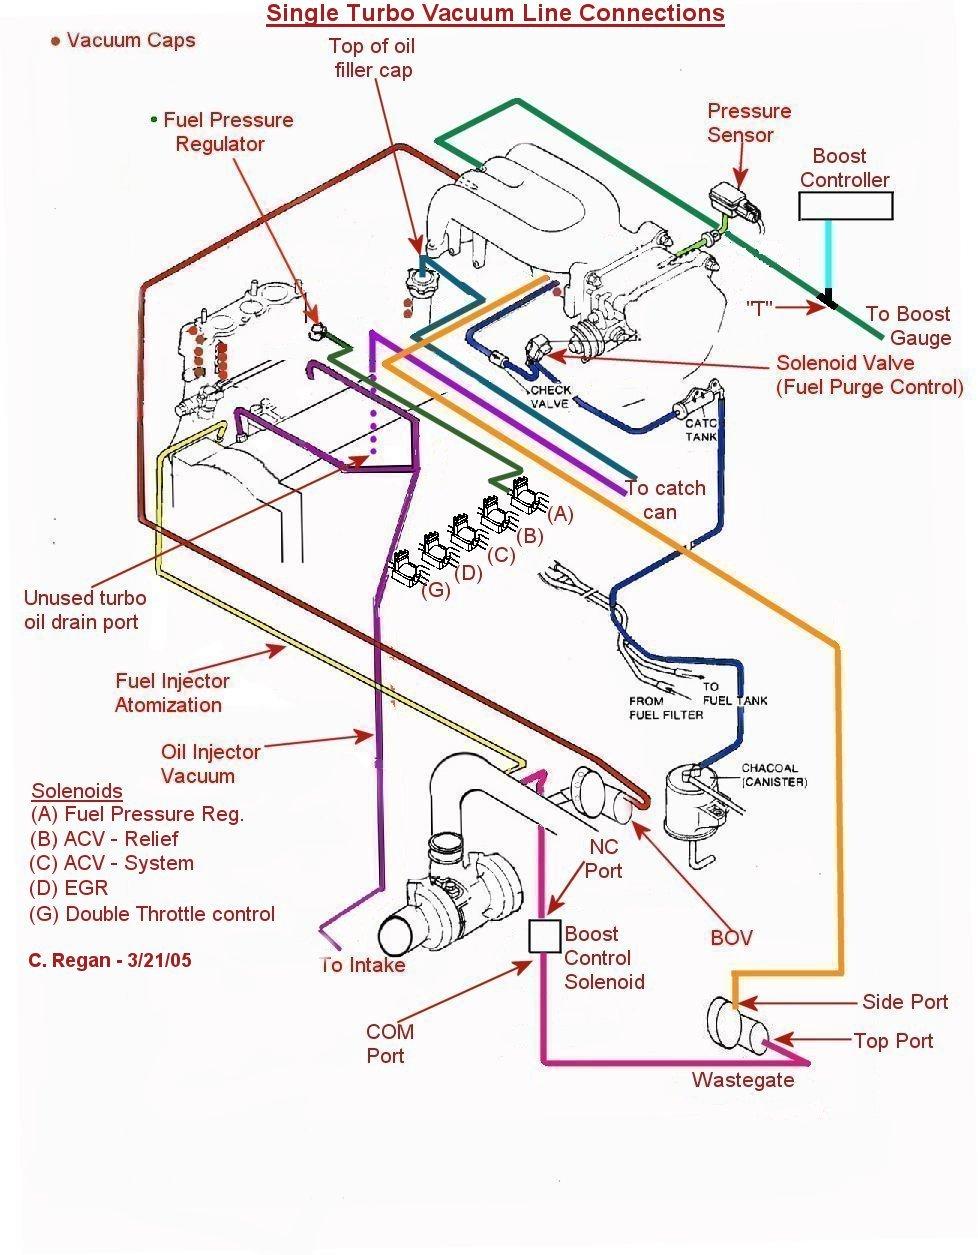 hight resolution of twin scroll vacuum line routing rx7club com mazda rx7 nissan 300zx twin turbo vacuum diagram subaru